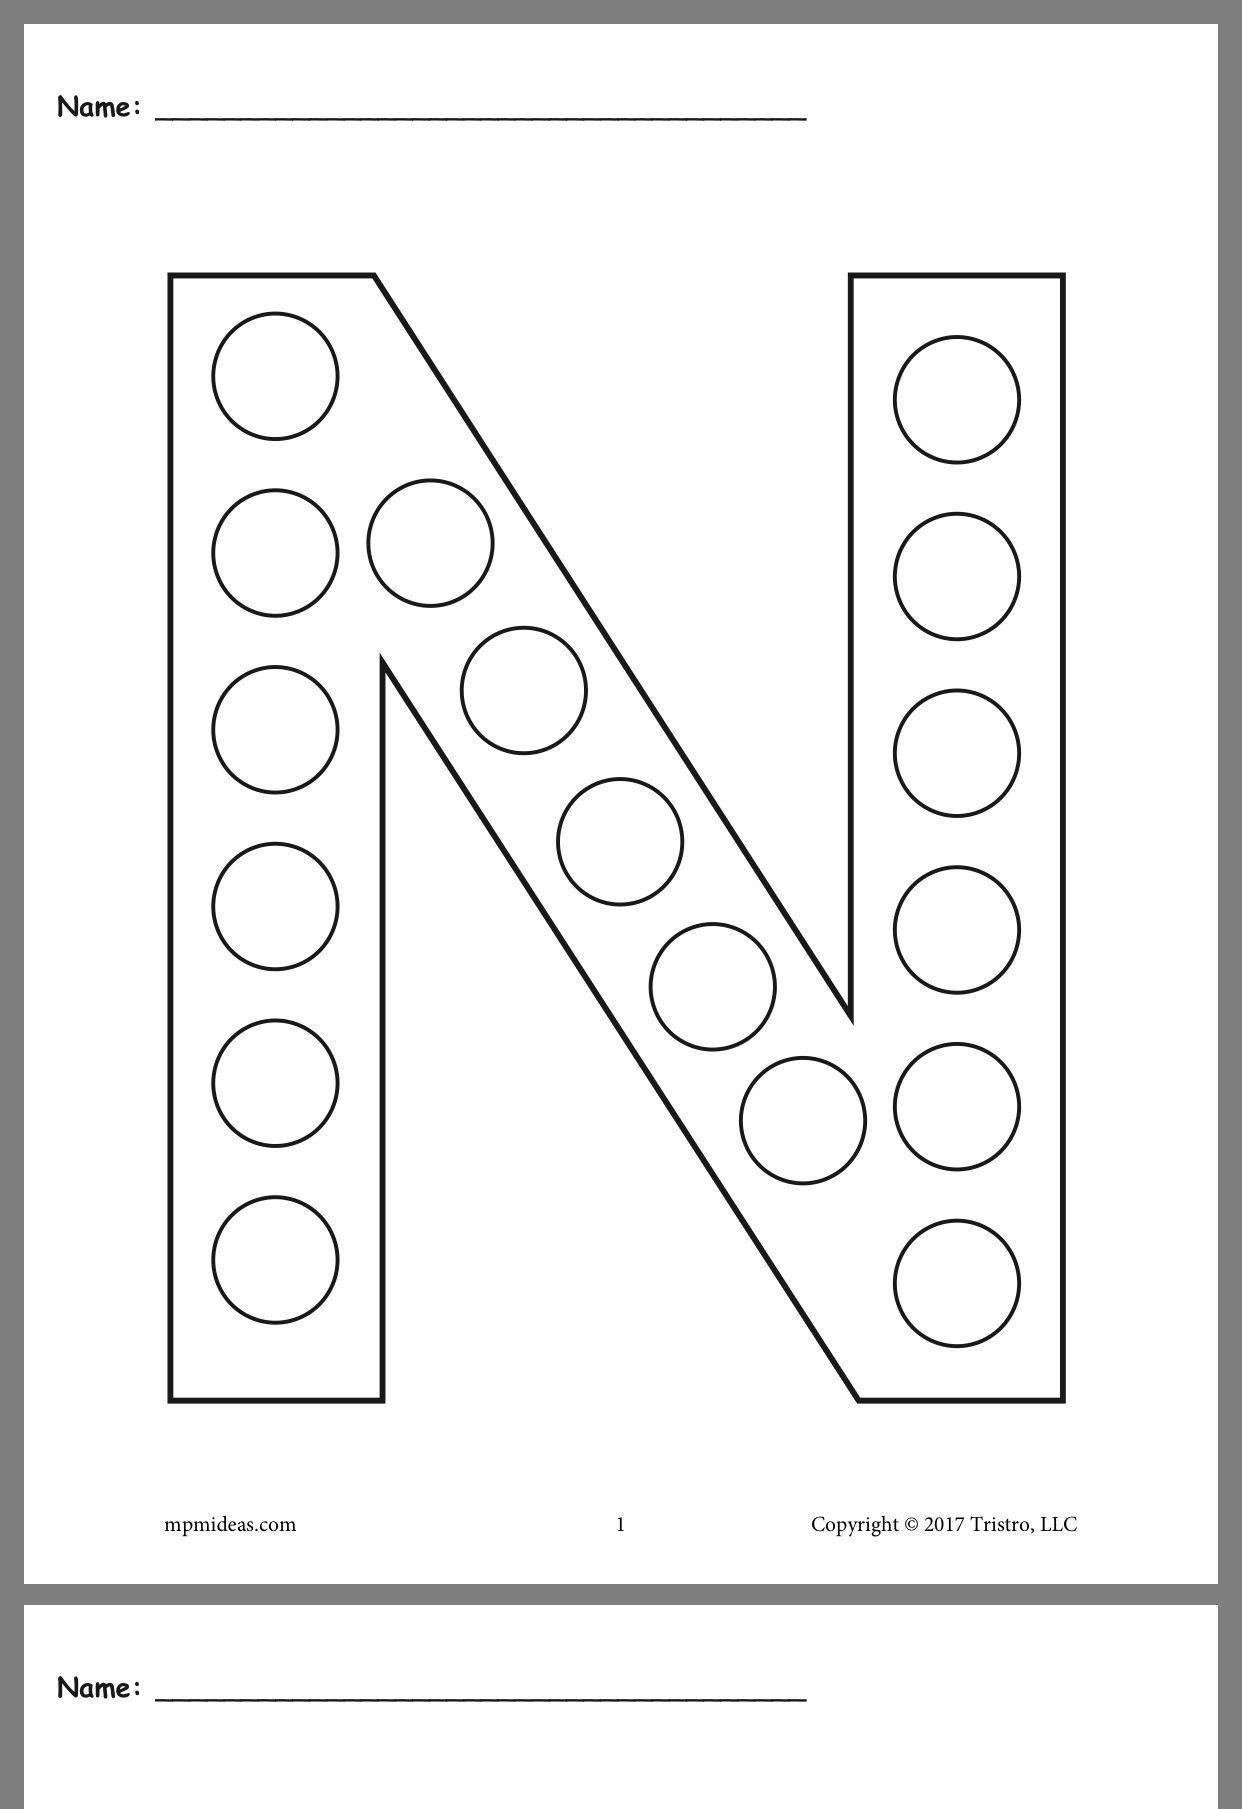 21 Best Alphabet Preschool Worksheets Images On Best